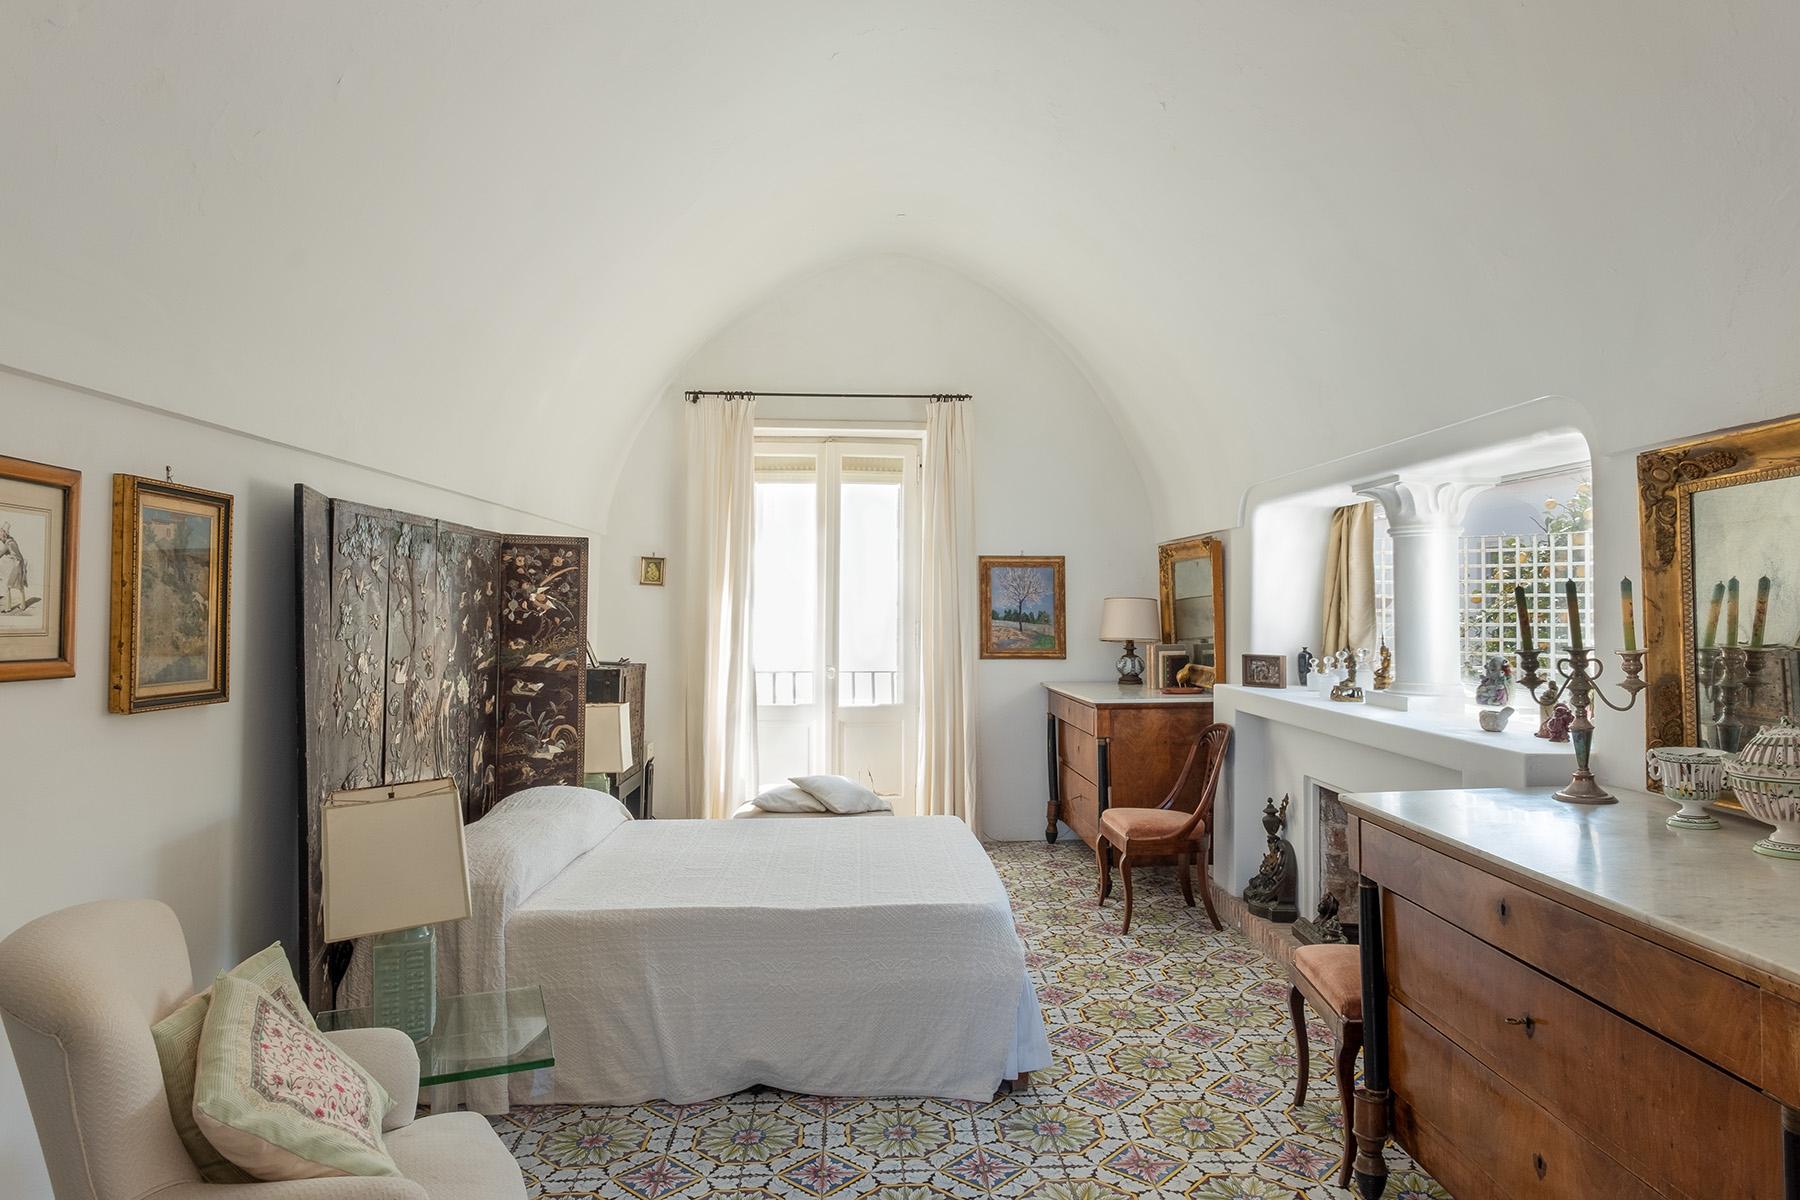 Casa indipendente in Vendita a Capri: 5 locali, 300 mq - Foto 24